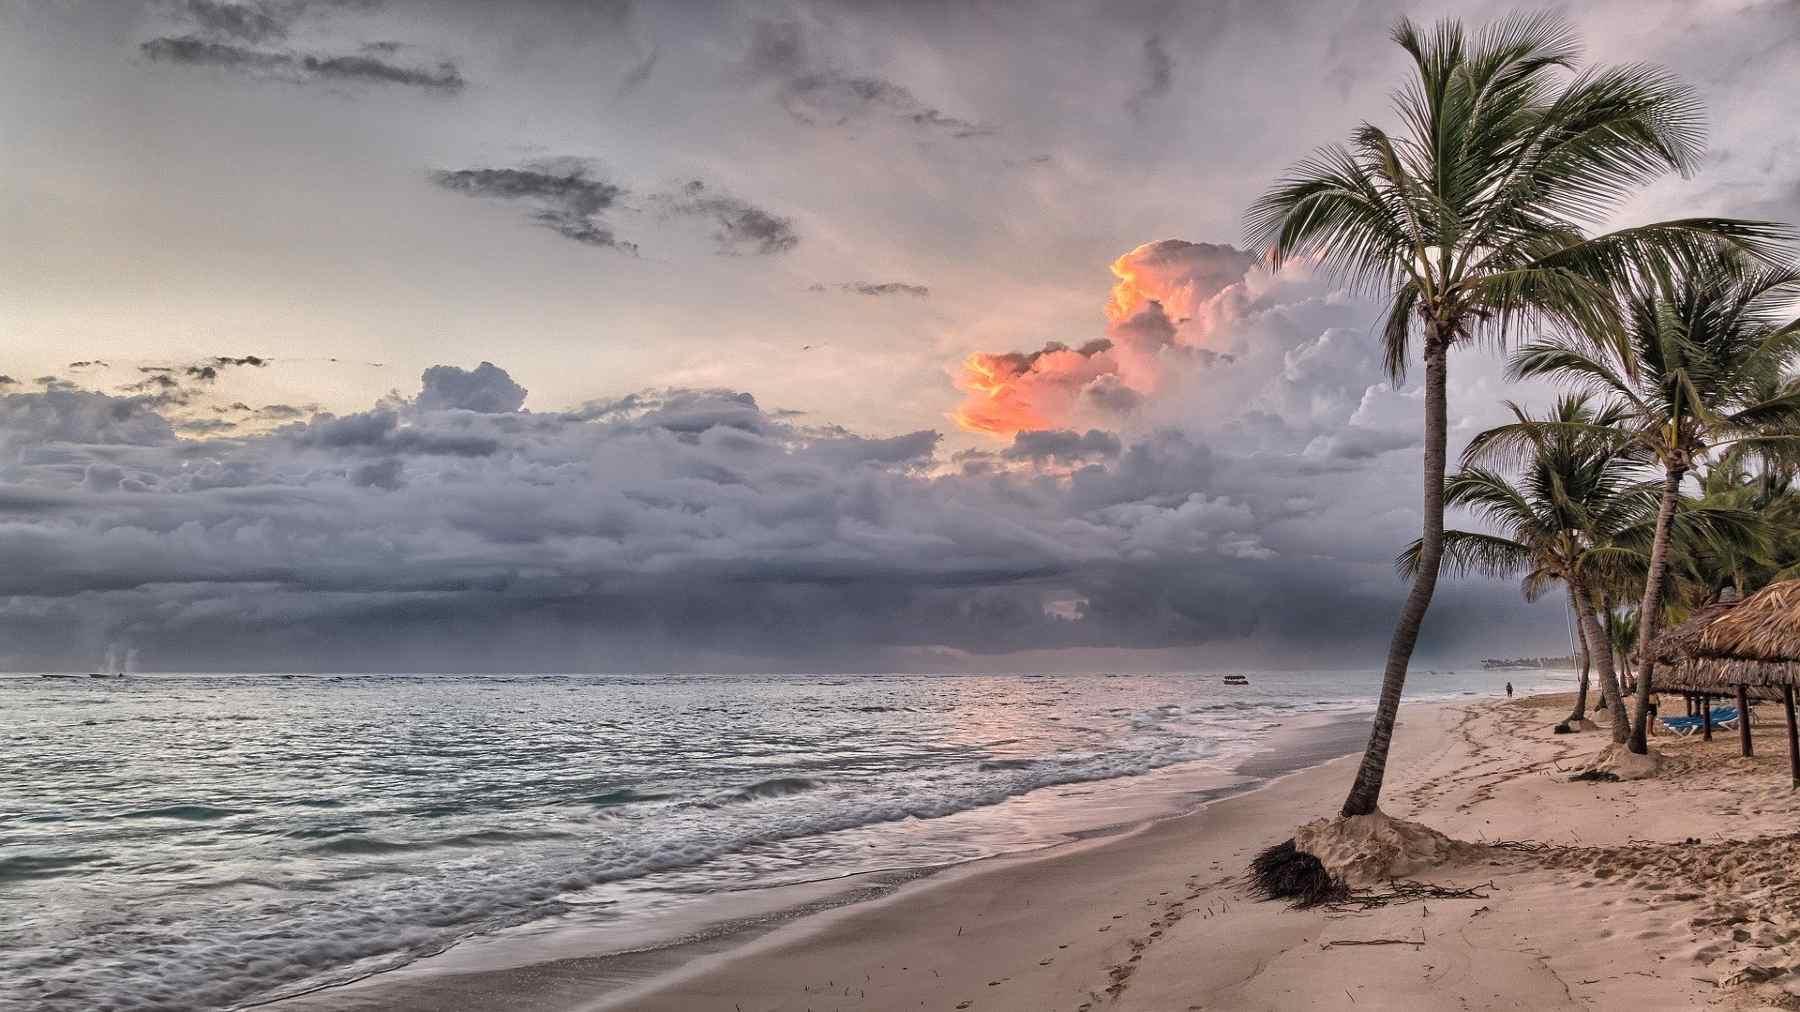 Dominican Republic Beach sunset